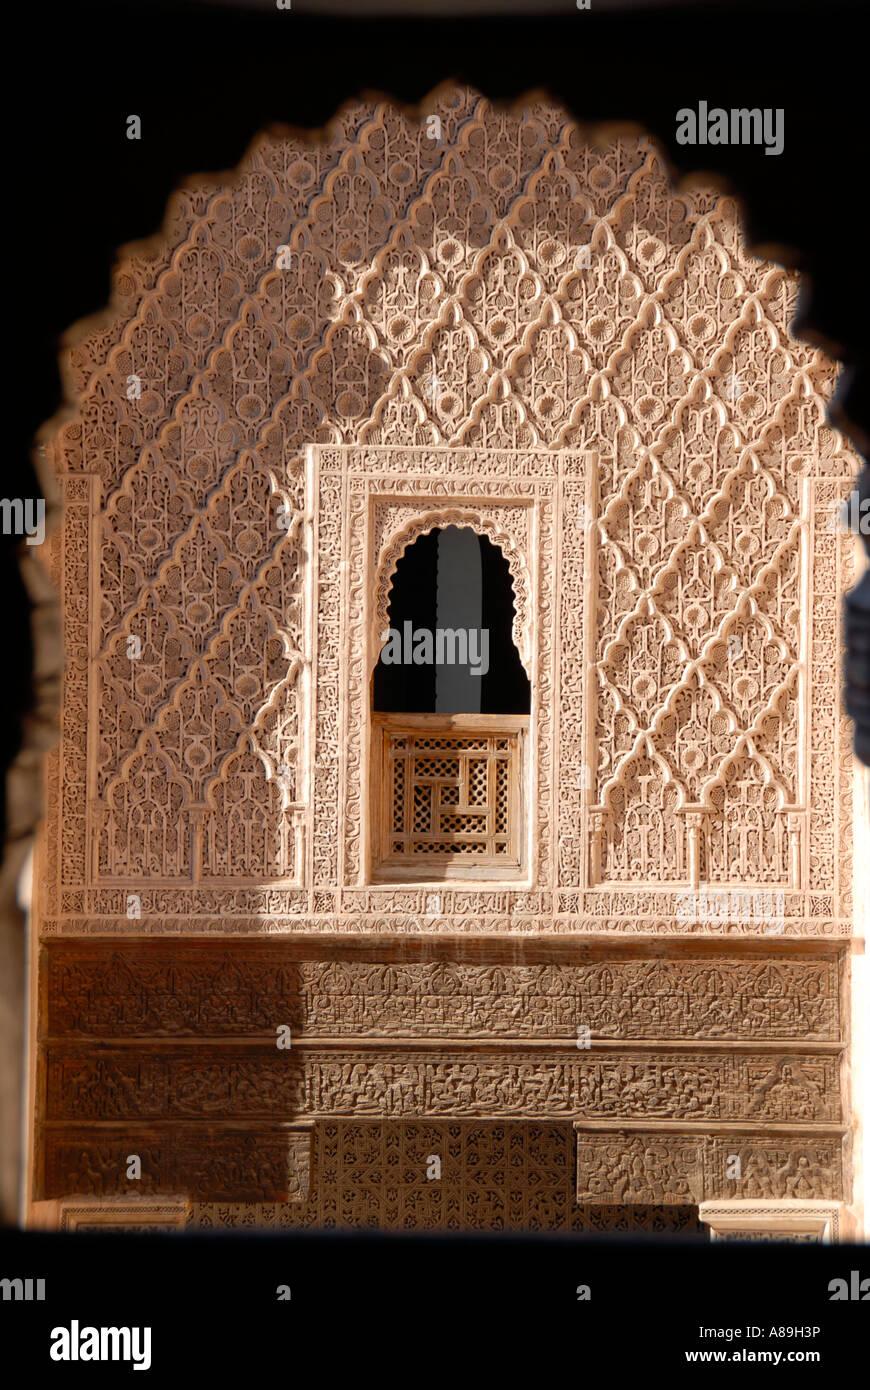 Oriental window with fine stucco richly decorated Medersa Ali Ben Youssef medina Marrakech Morocco Stock Photo